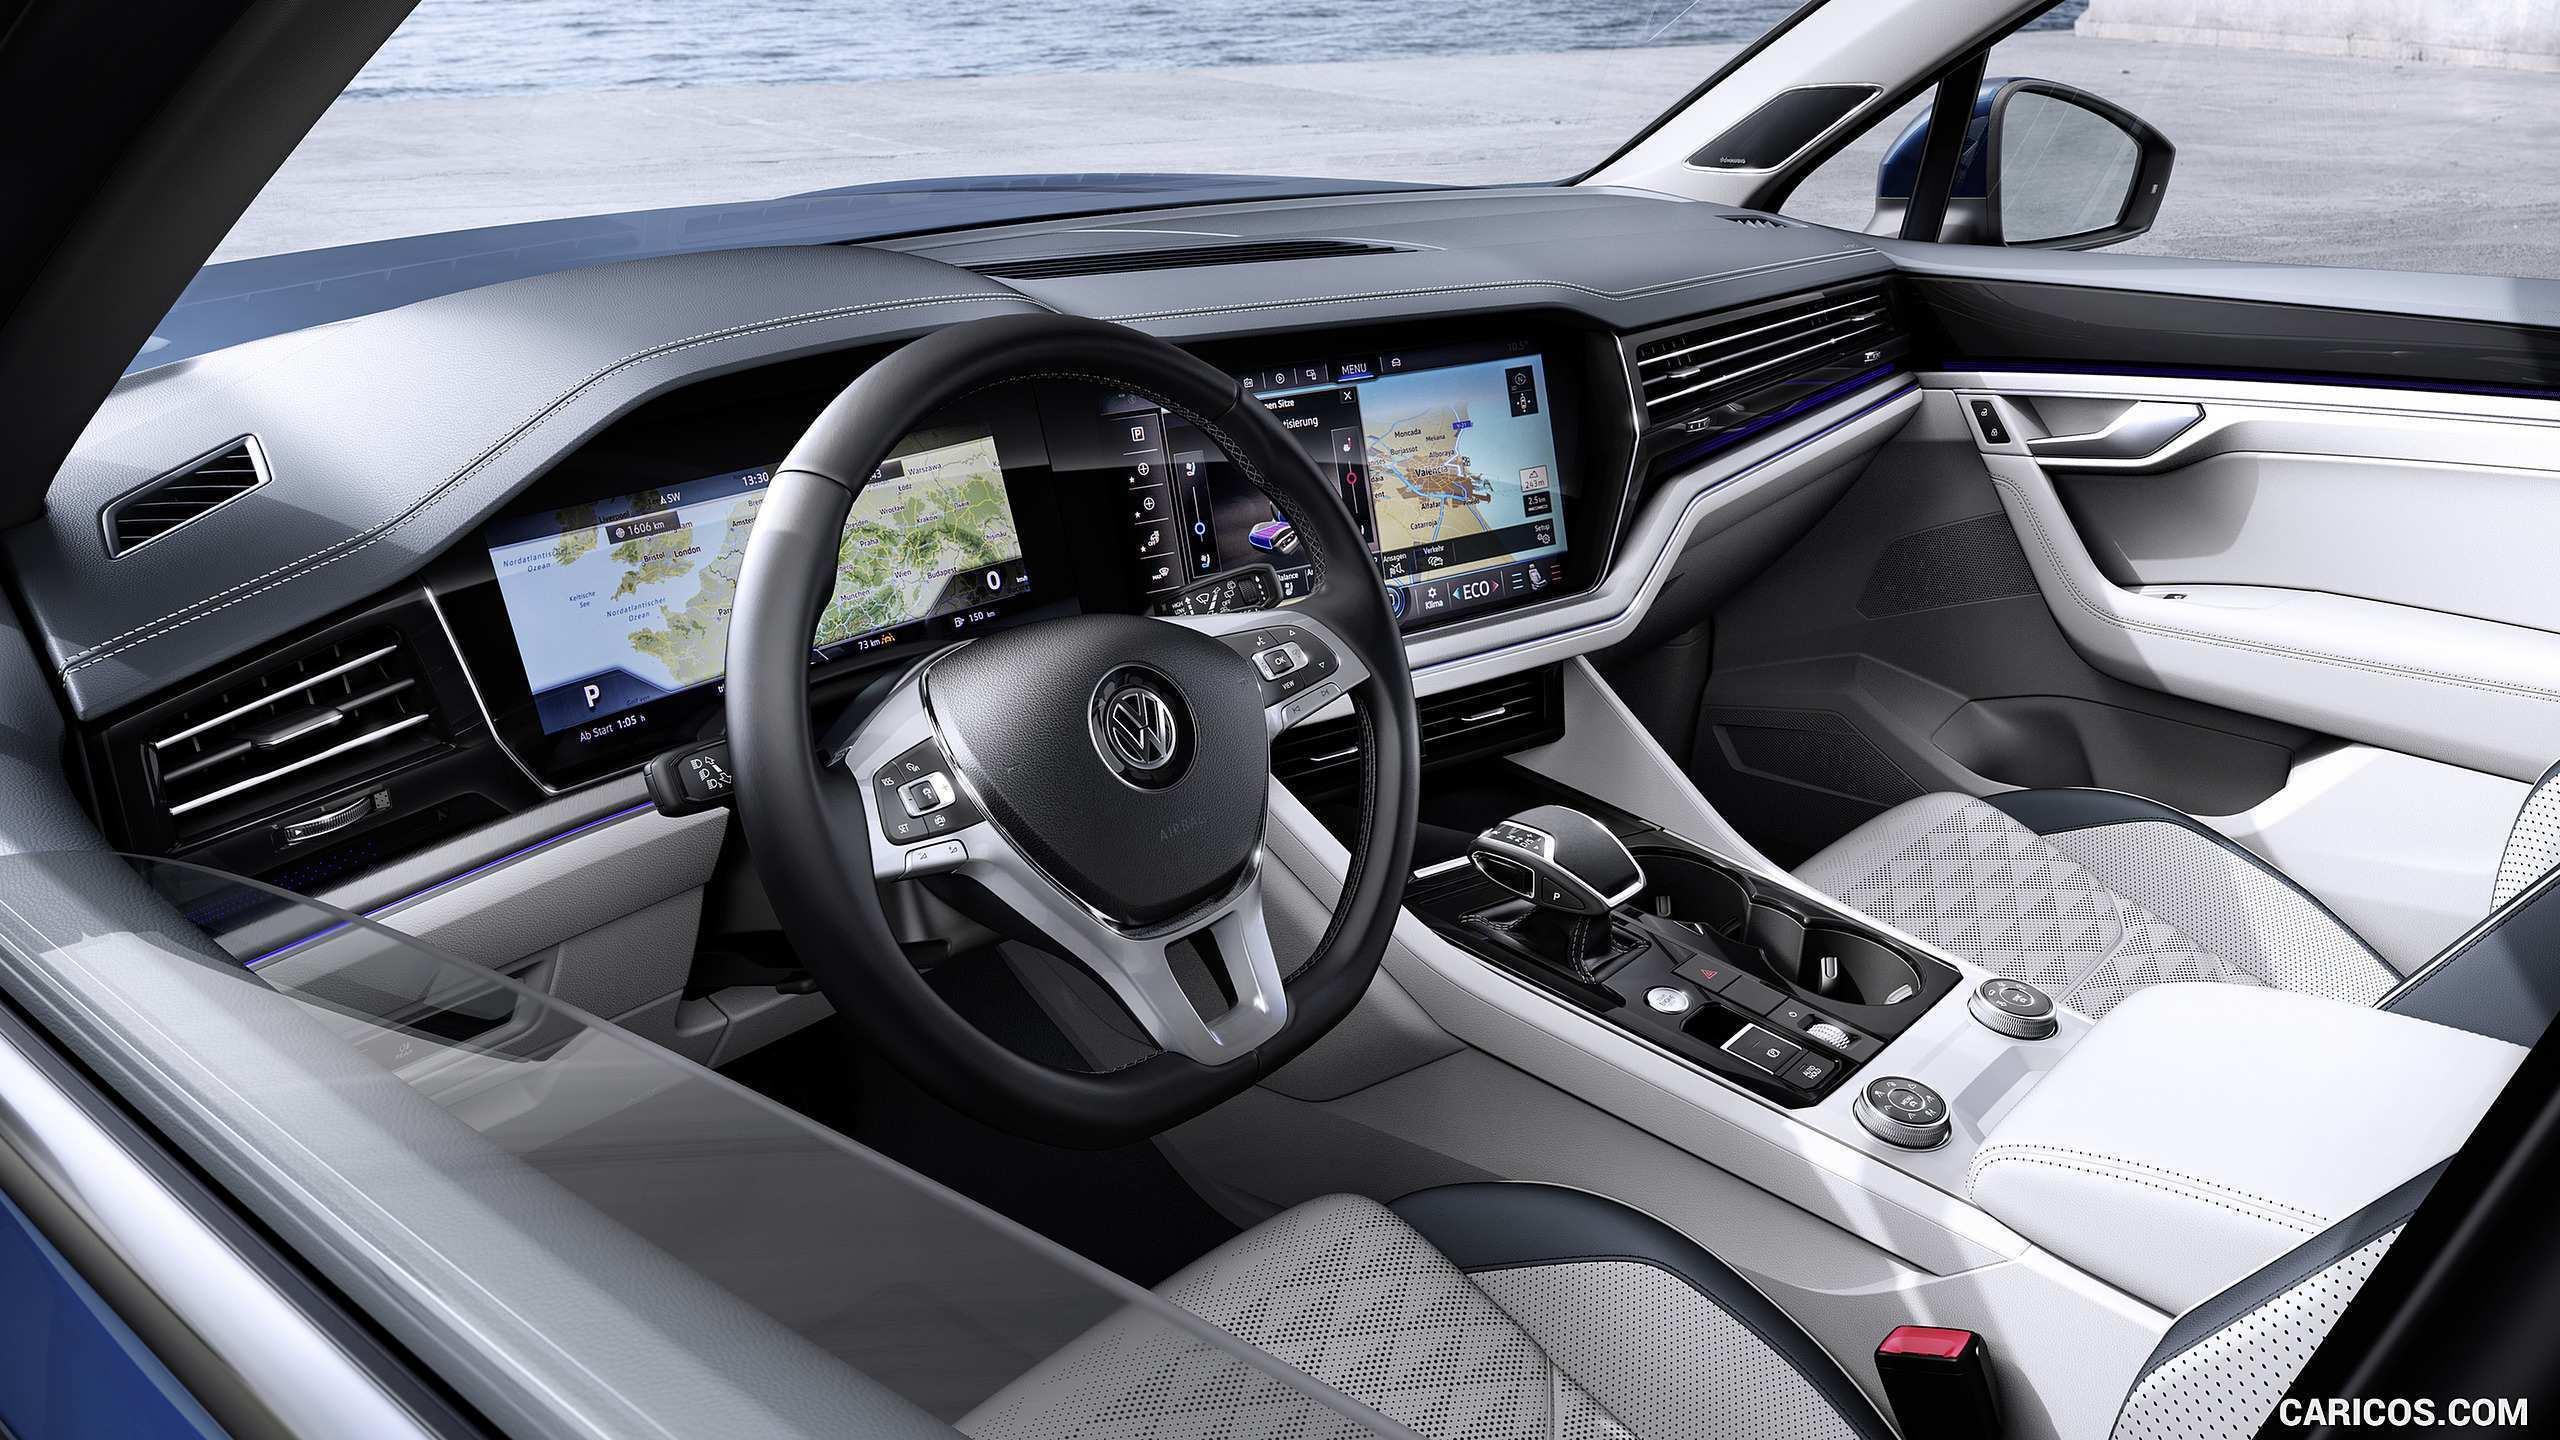 28 Best Review 2019 Volkswagen Touareg Interior Photos by 2019 Volkswagen Touareg Interior